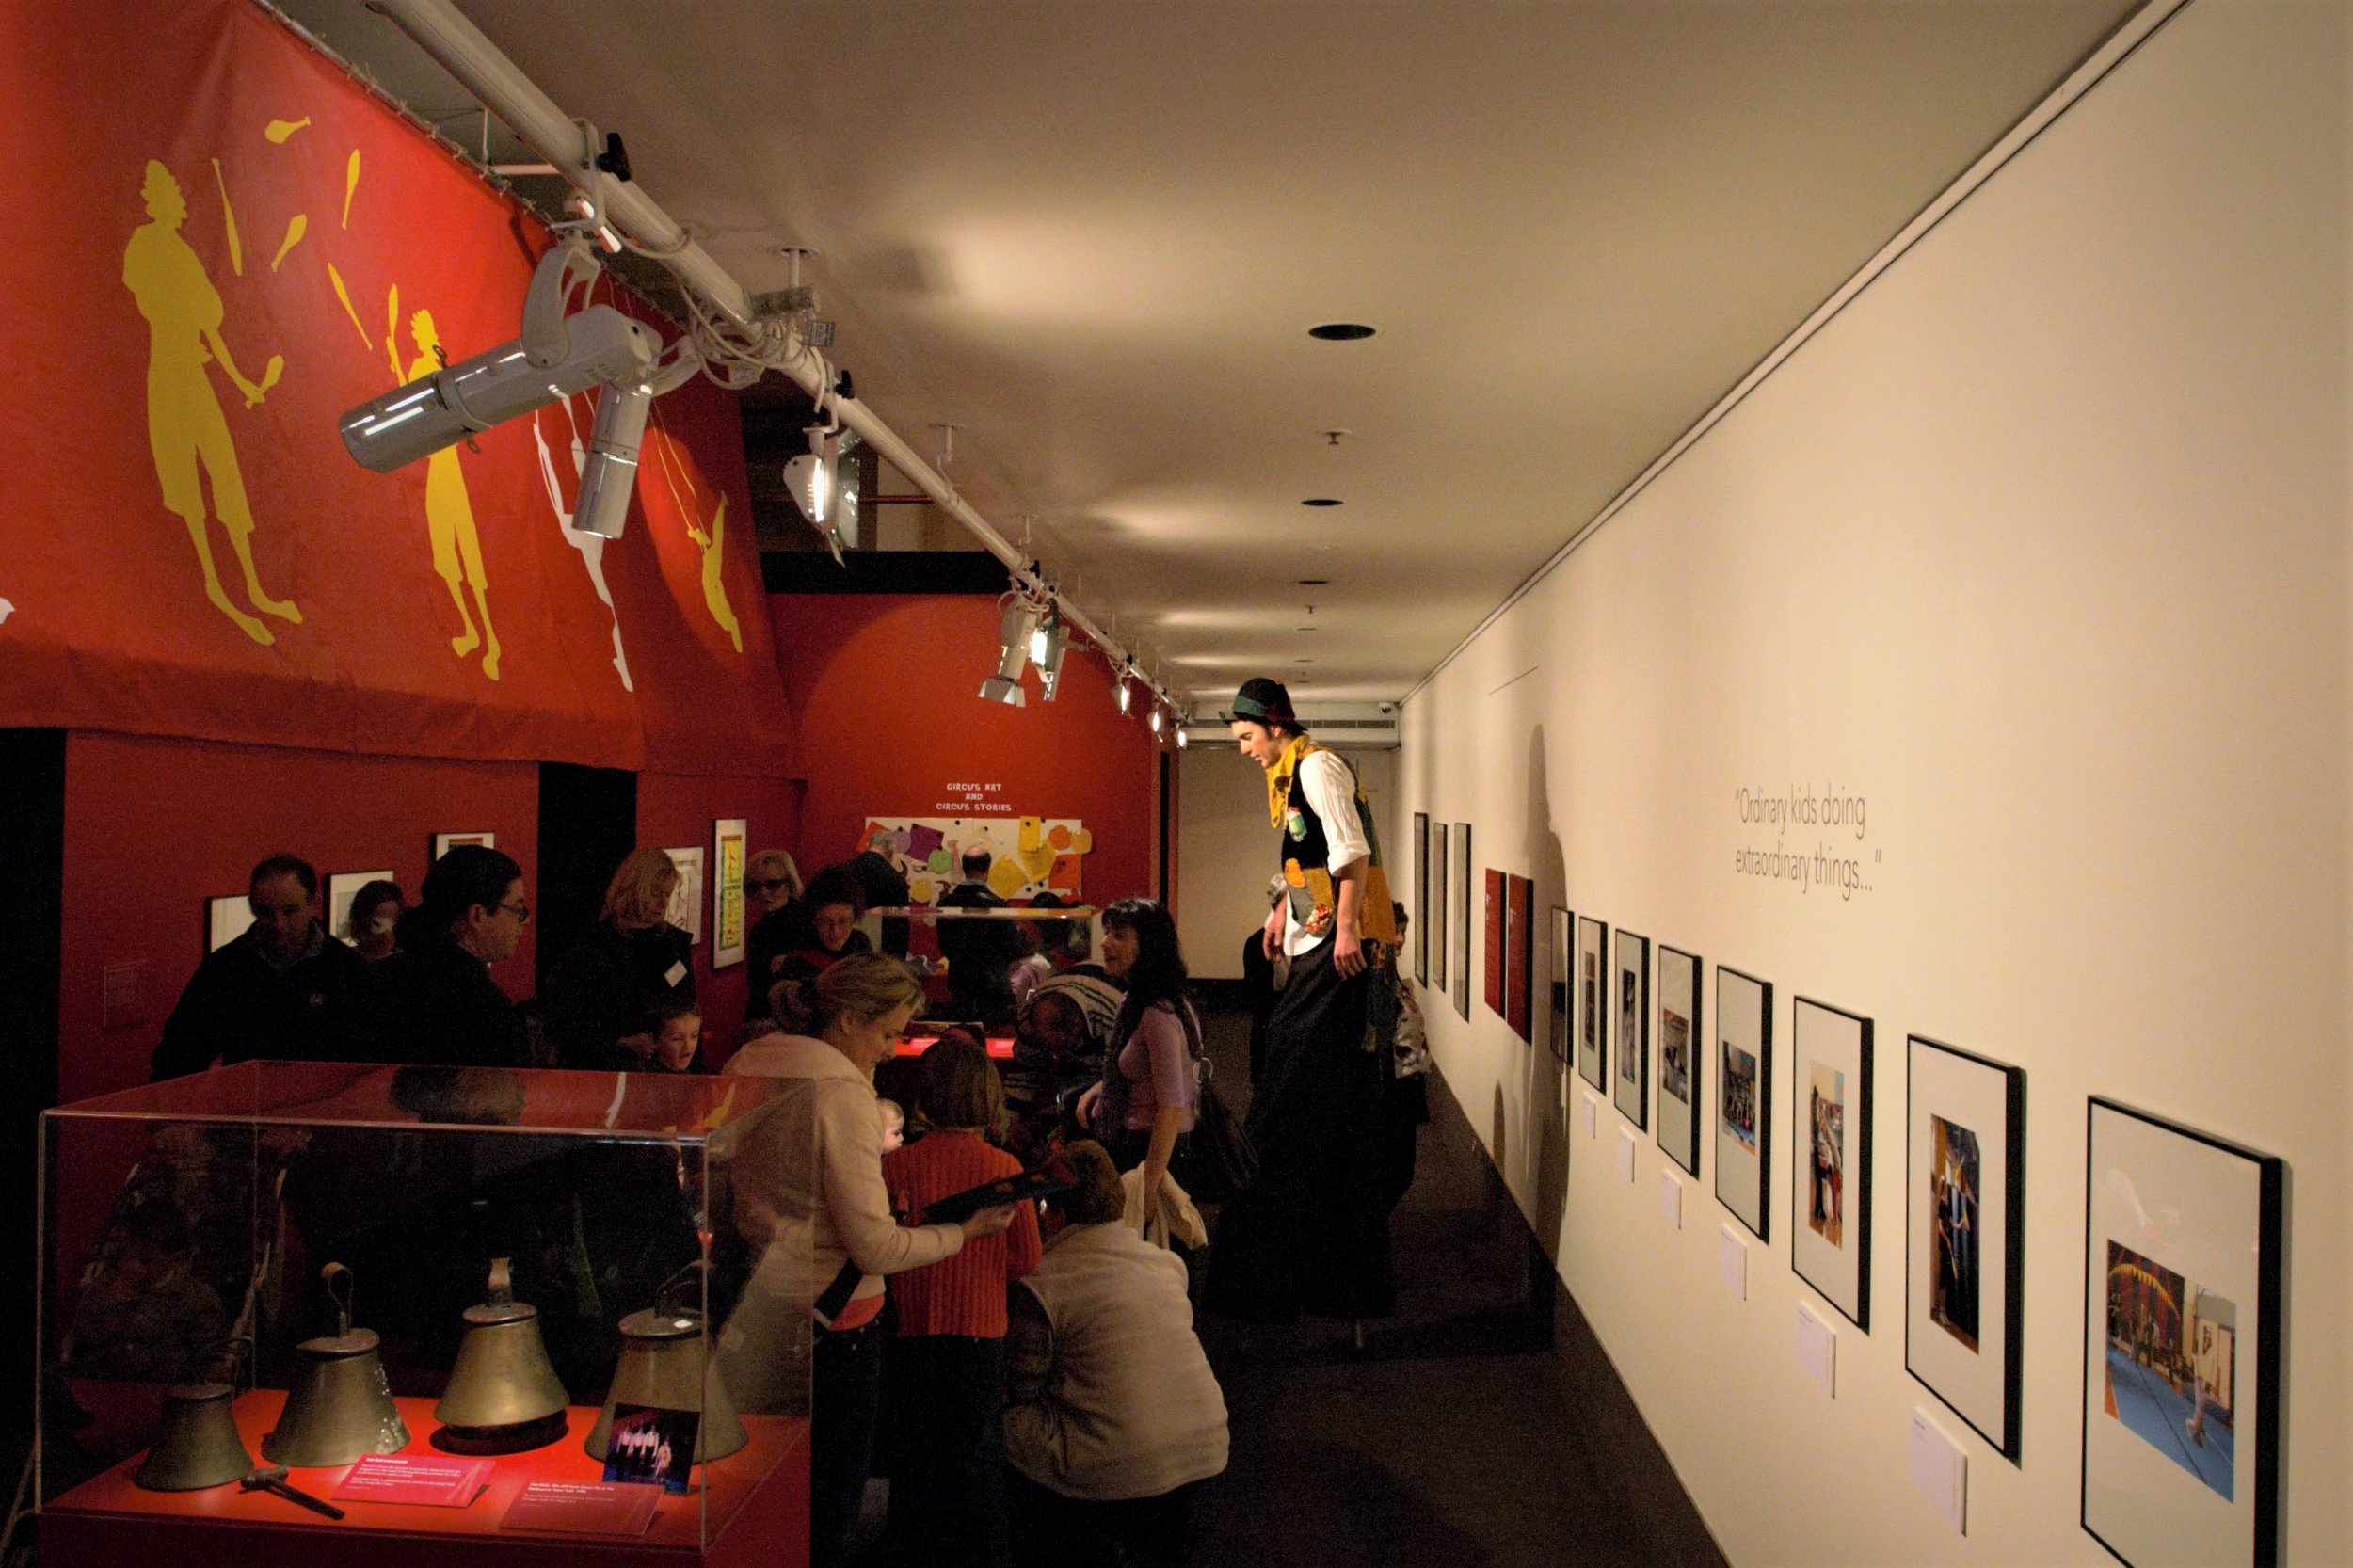 The Magic Tent exhibition